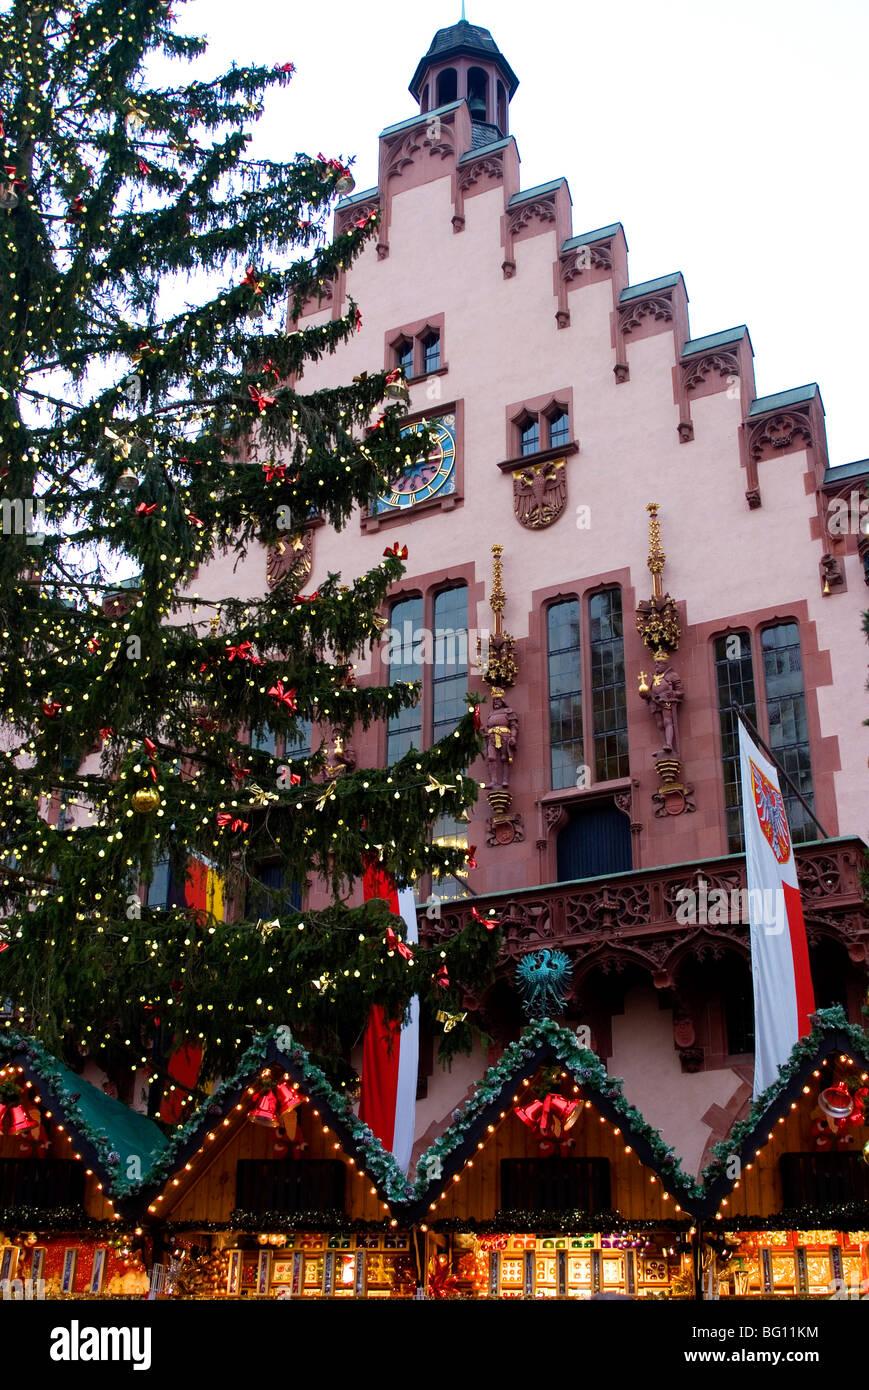 Weihnachtsmarkt (Christmas Market), Frankfurt, Hesse, Germany, Europe - Stock Image